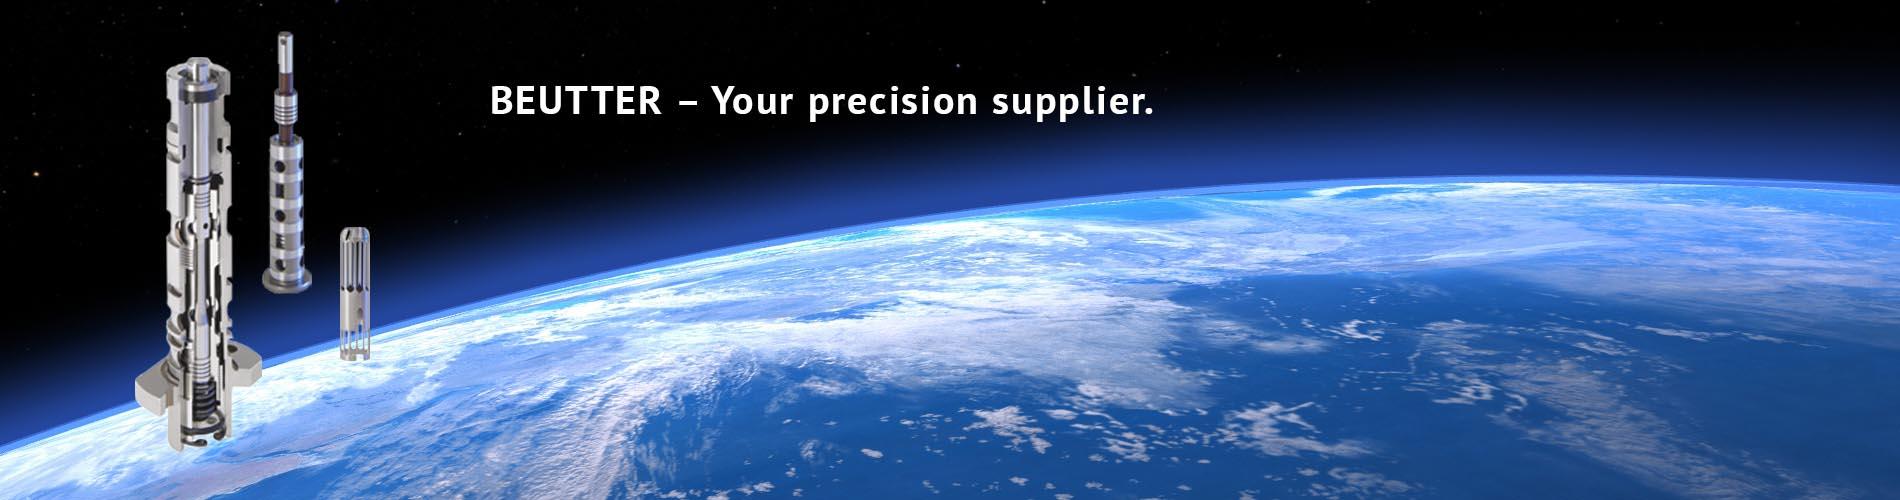 beutter_precision-engineering_englisch.jpg